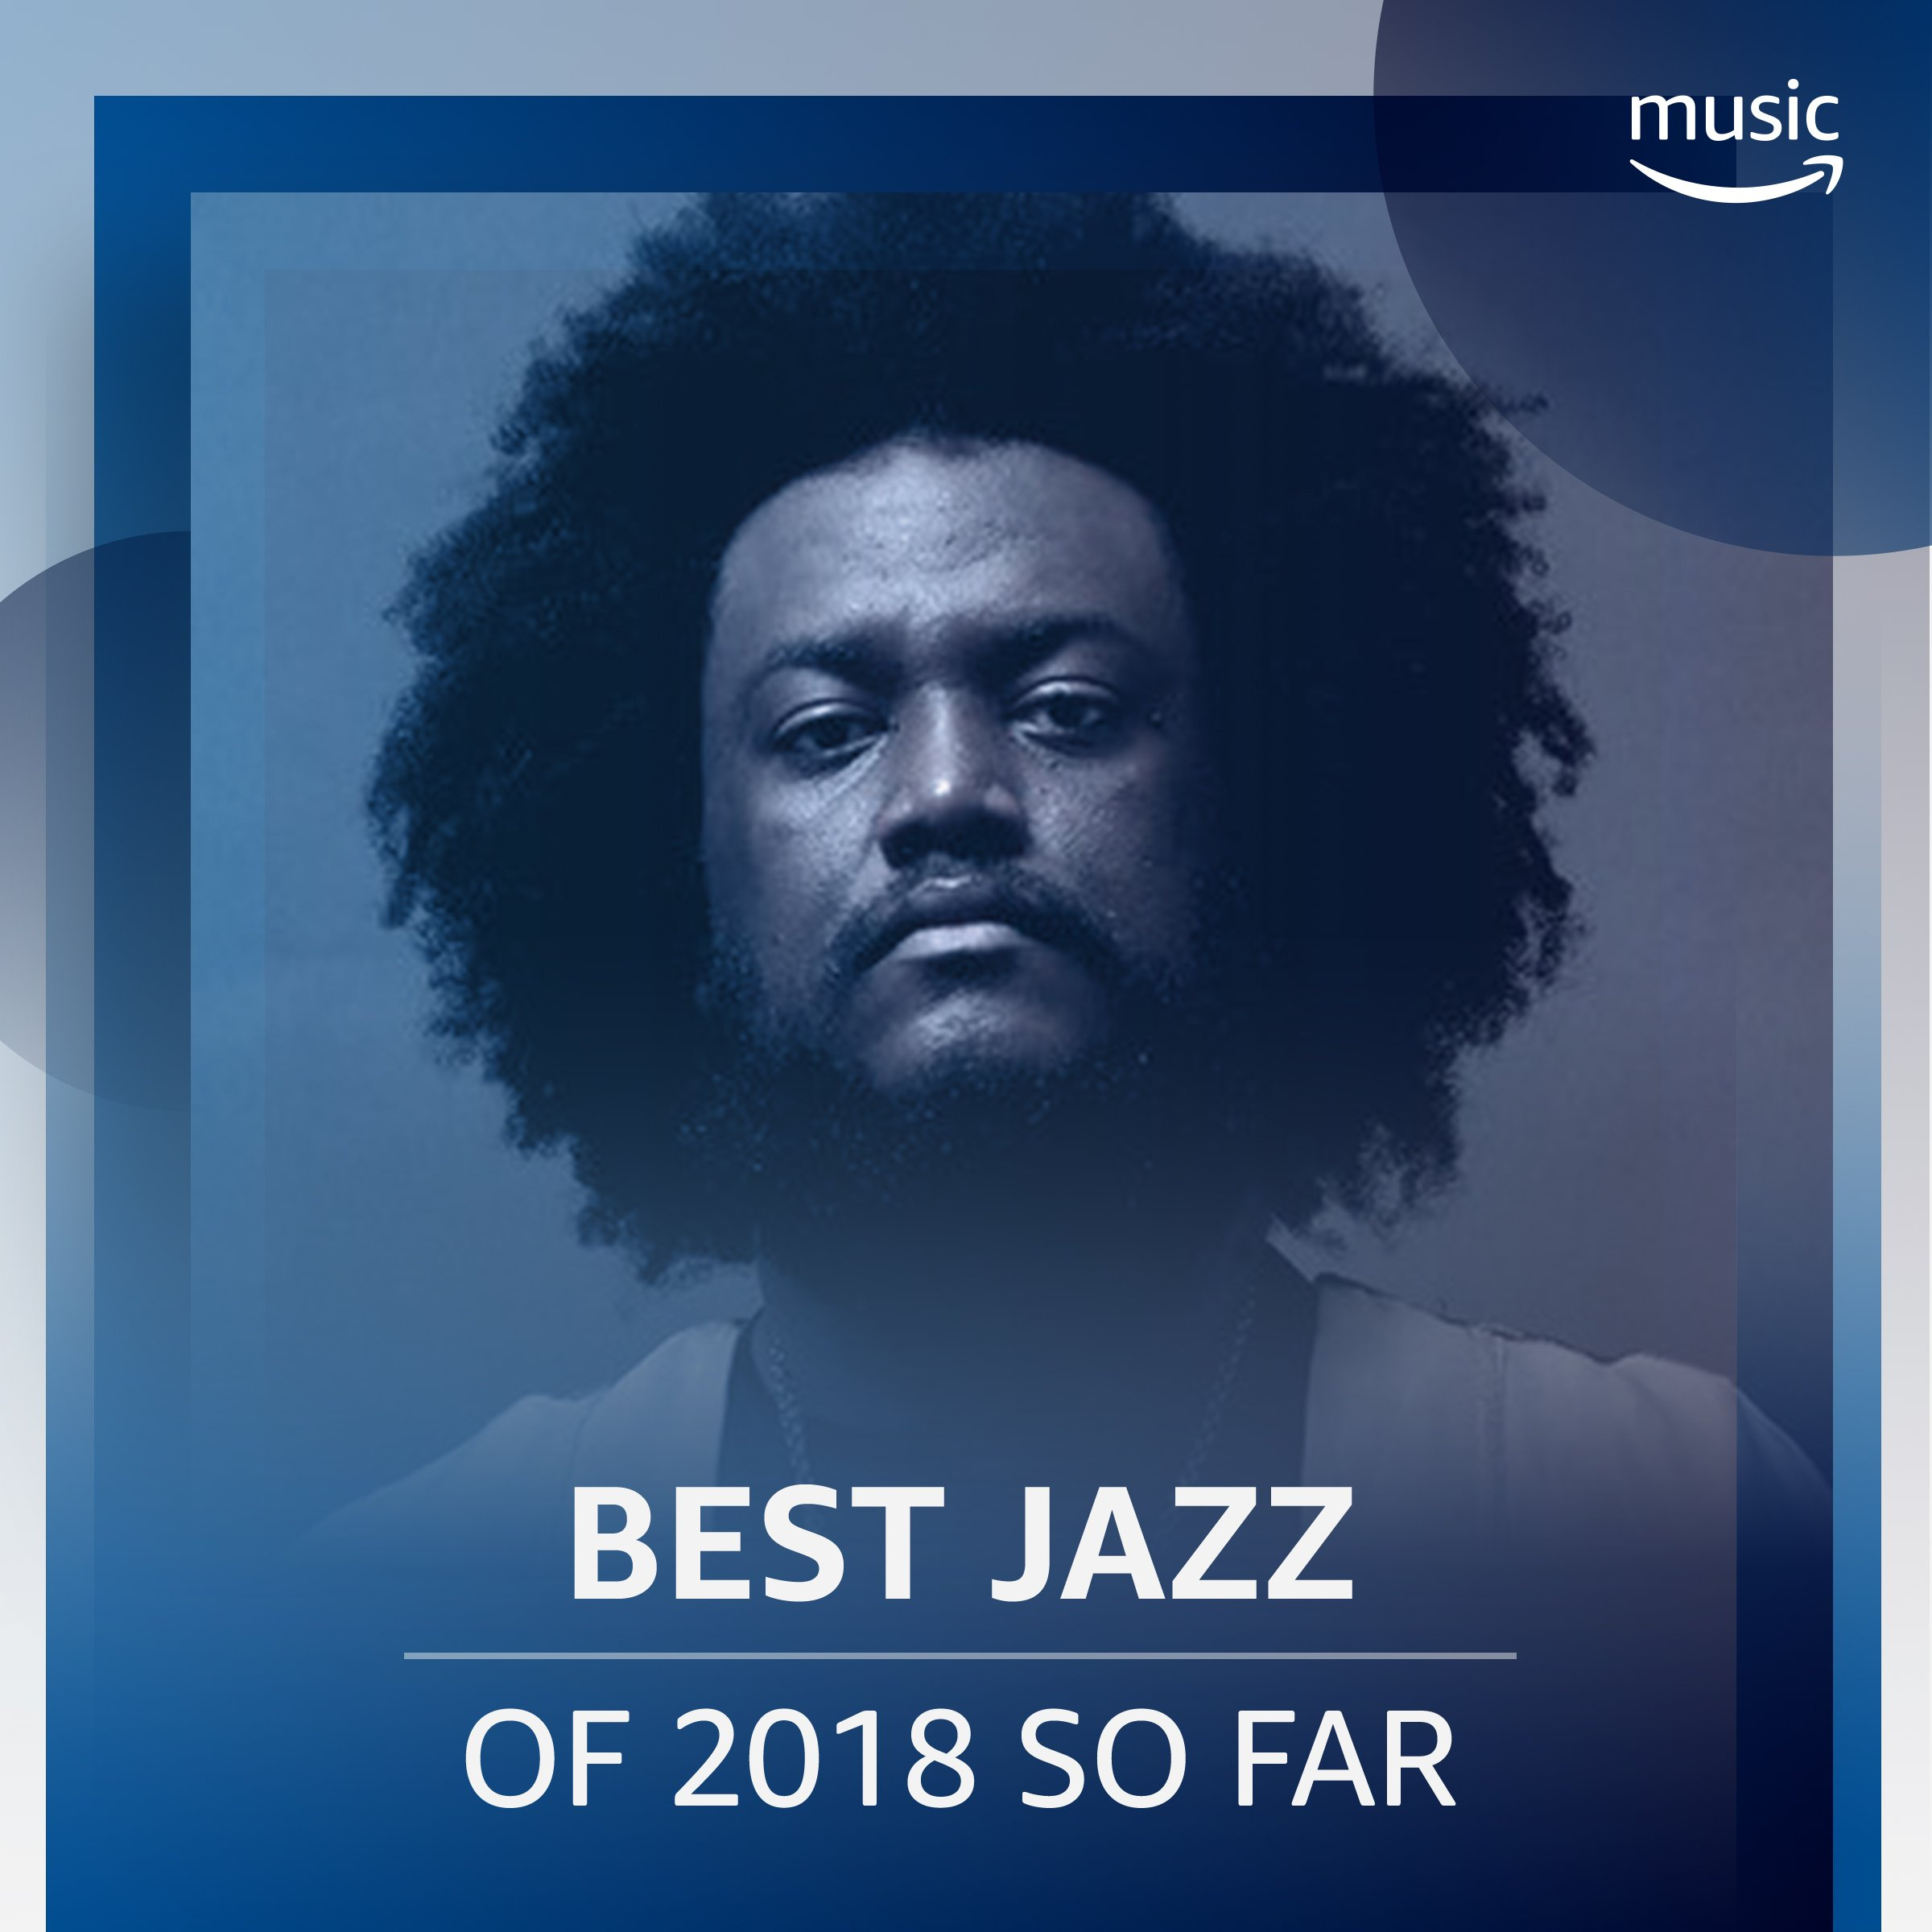 Best Jazz of 2018 So Far